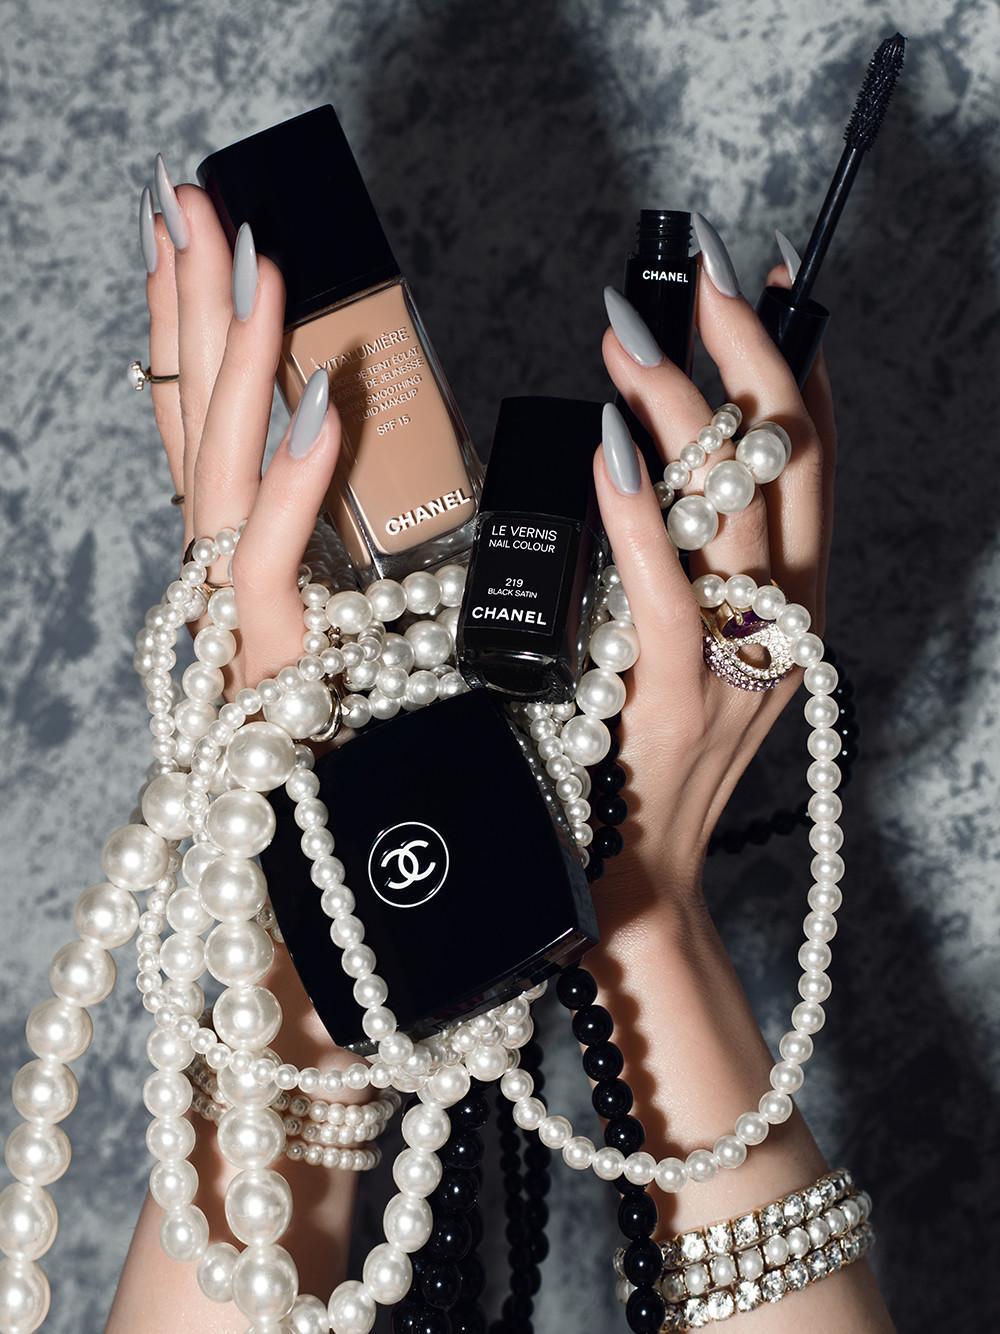 Visagistin Hand Make up, Maniküre, Nägel in grau